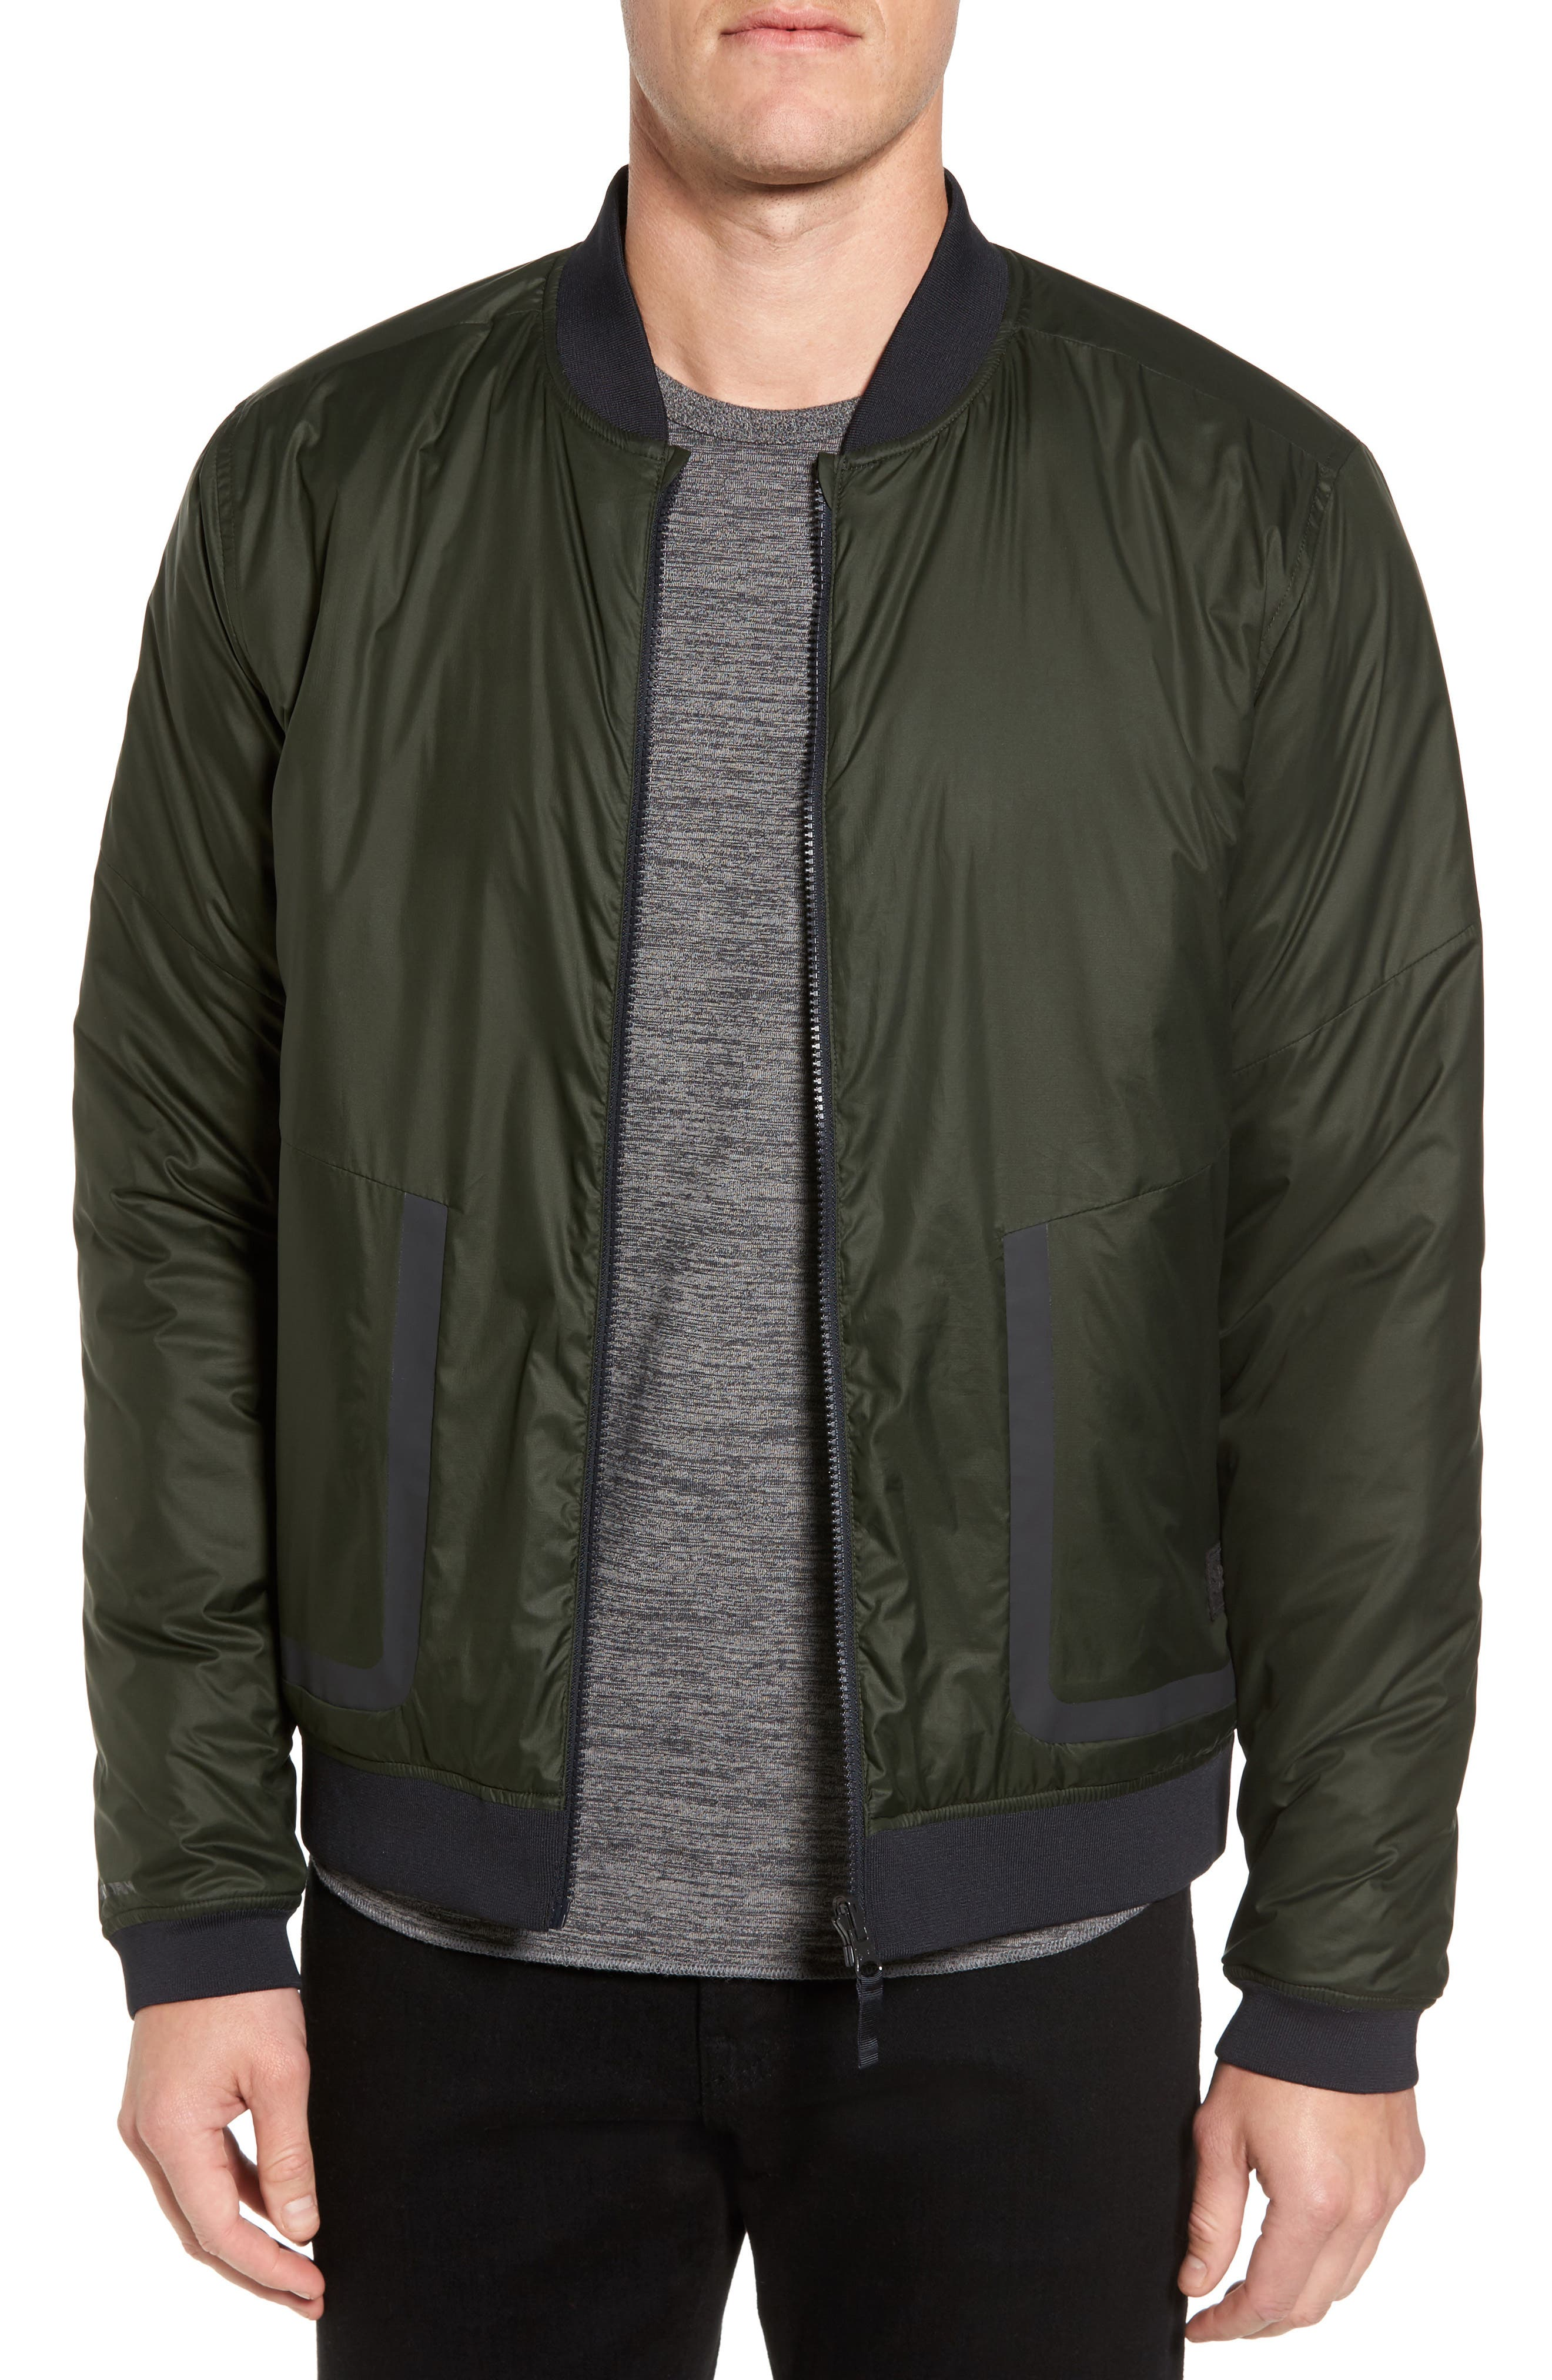 Sportstyle Reactor Reversible Bomber Jacket,                         Main,                         color, Green / Moss Green / Black